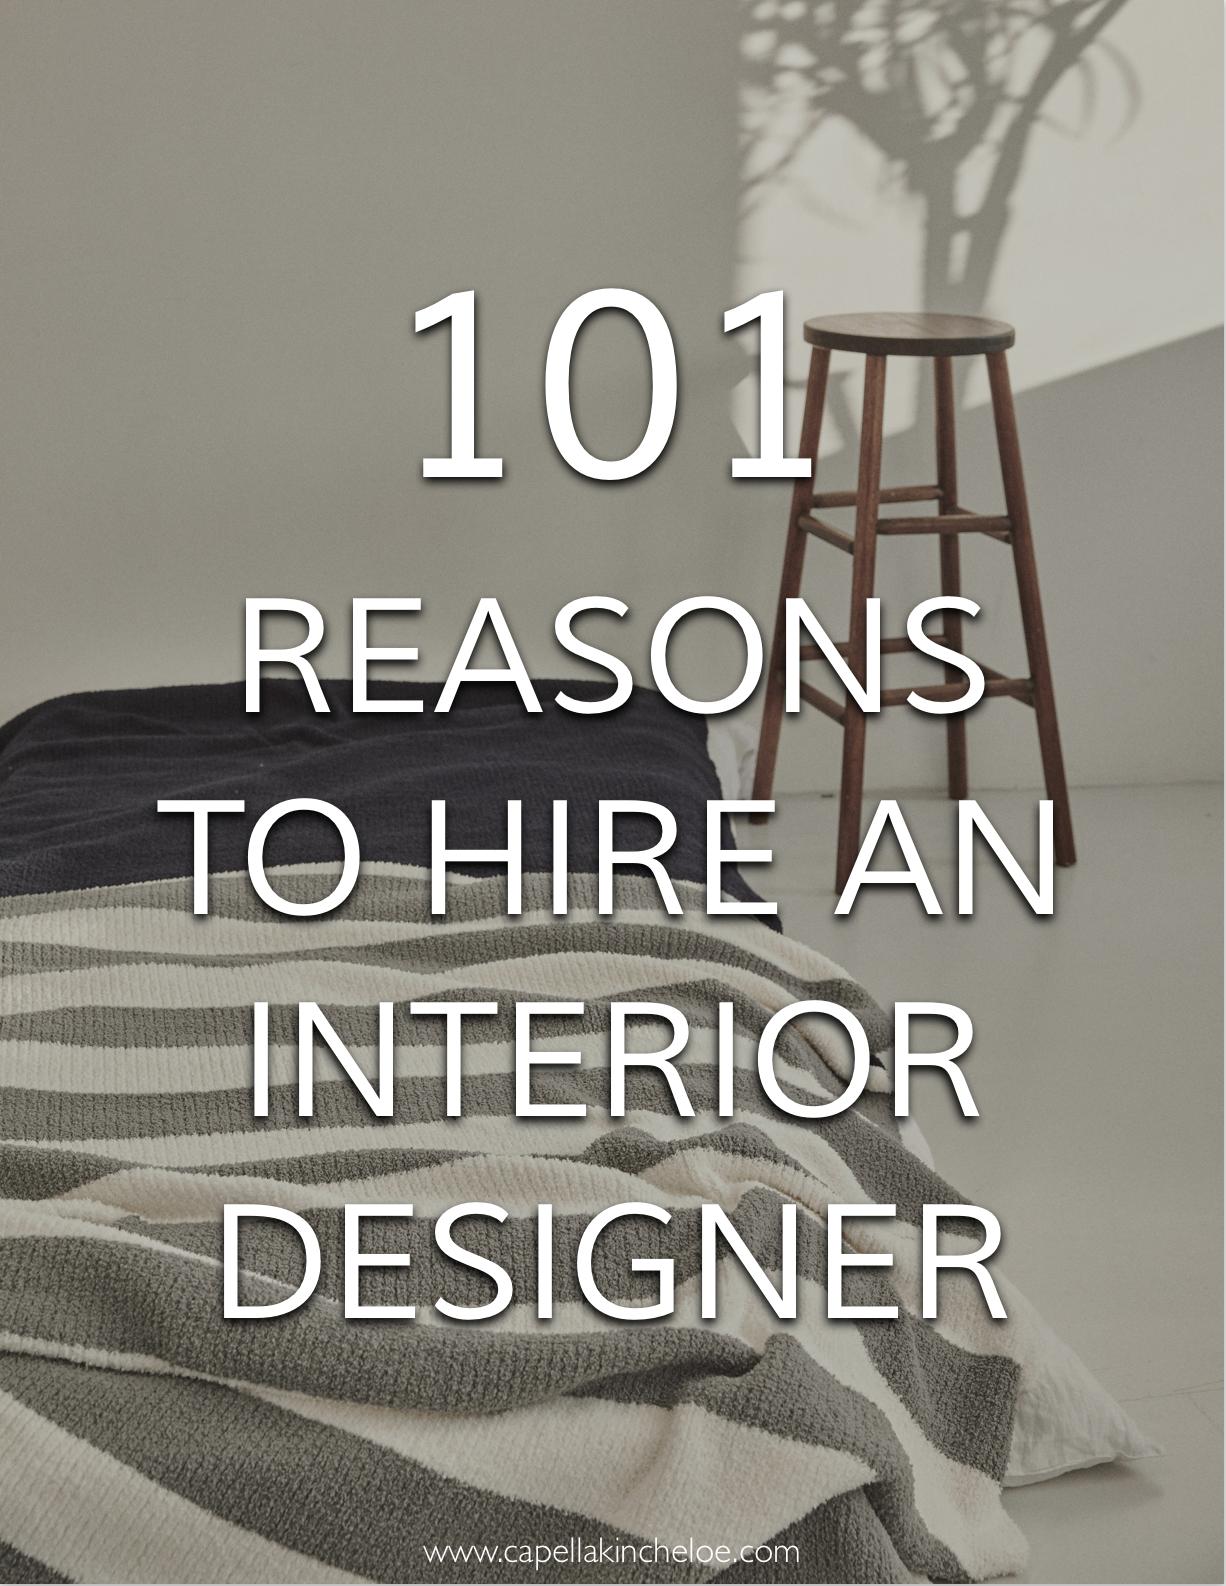 101 Reasons To Hire An Interior Designer Interior Design Books